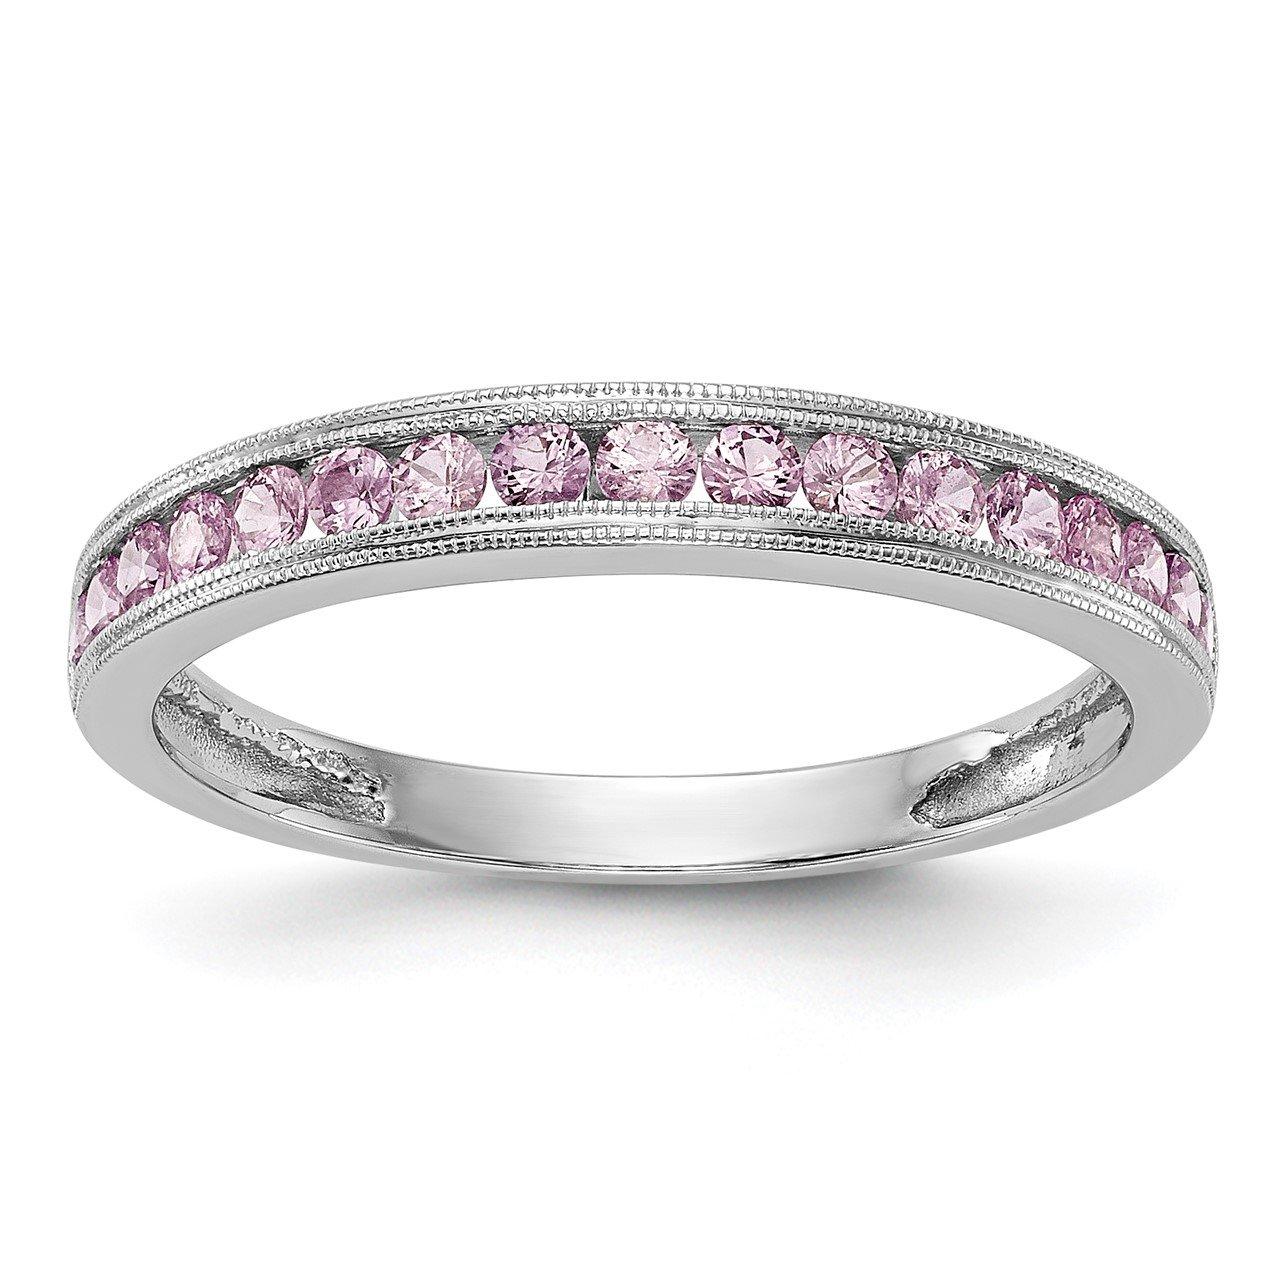 14k White Gold Pink Sapphire Band